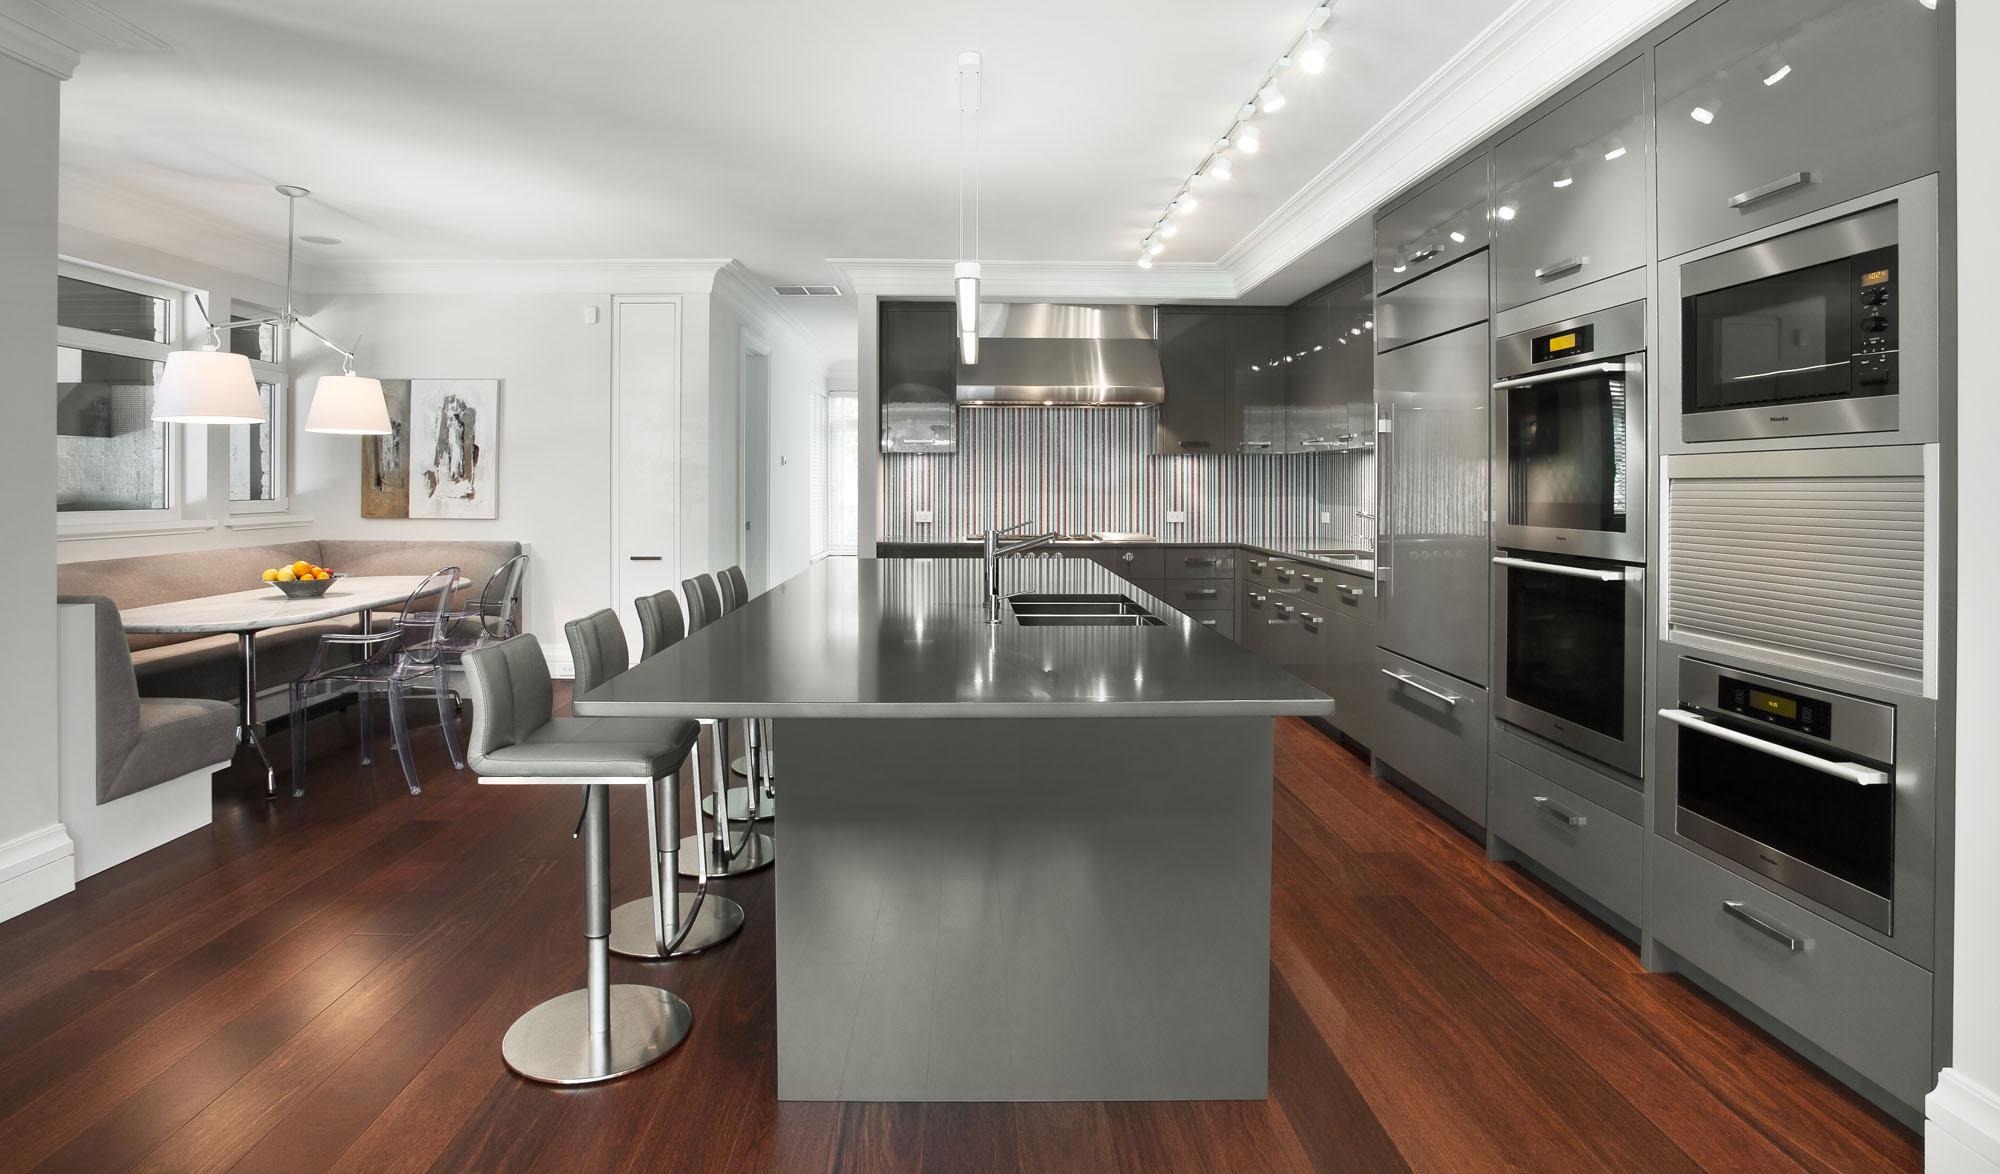 Light Gray Kitchen Walls Grey Kitchen Cabinets Yellow Walls Com Grey Kitchen Cabinets